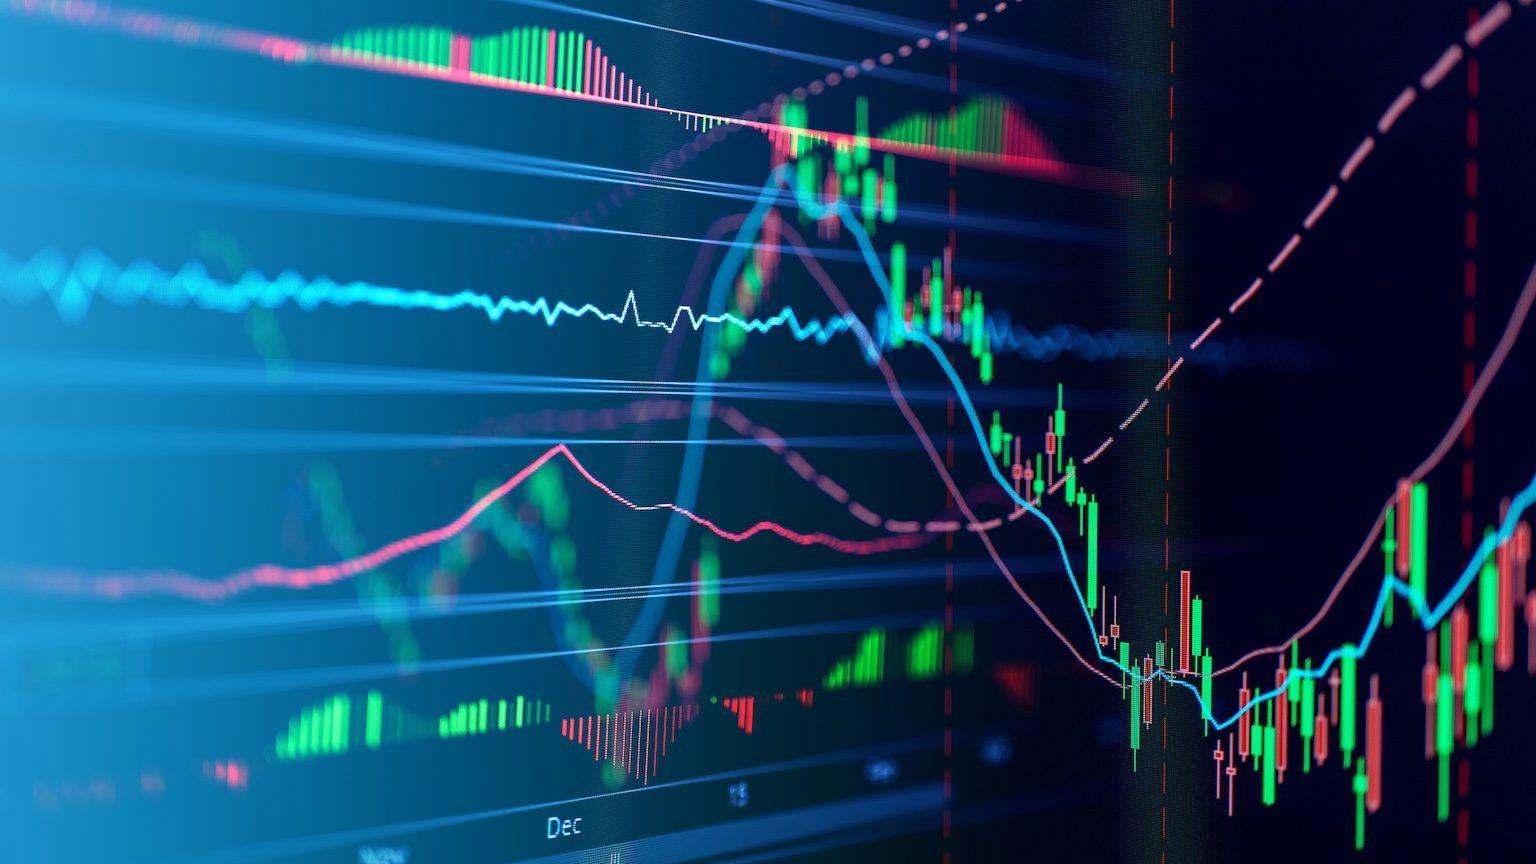 Virtual stock market graphs